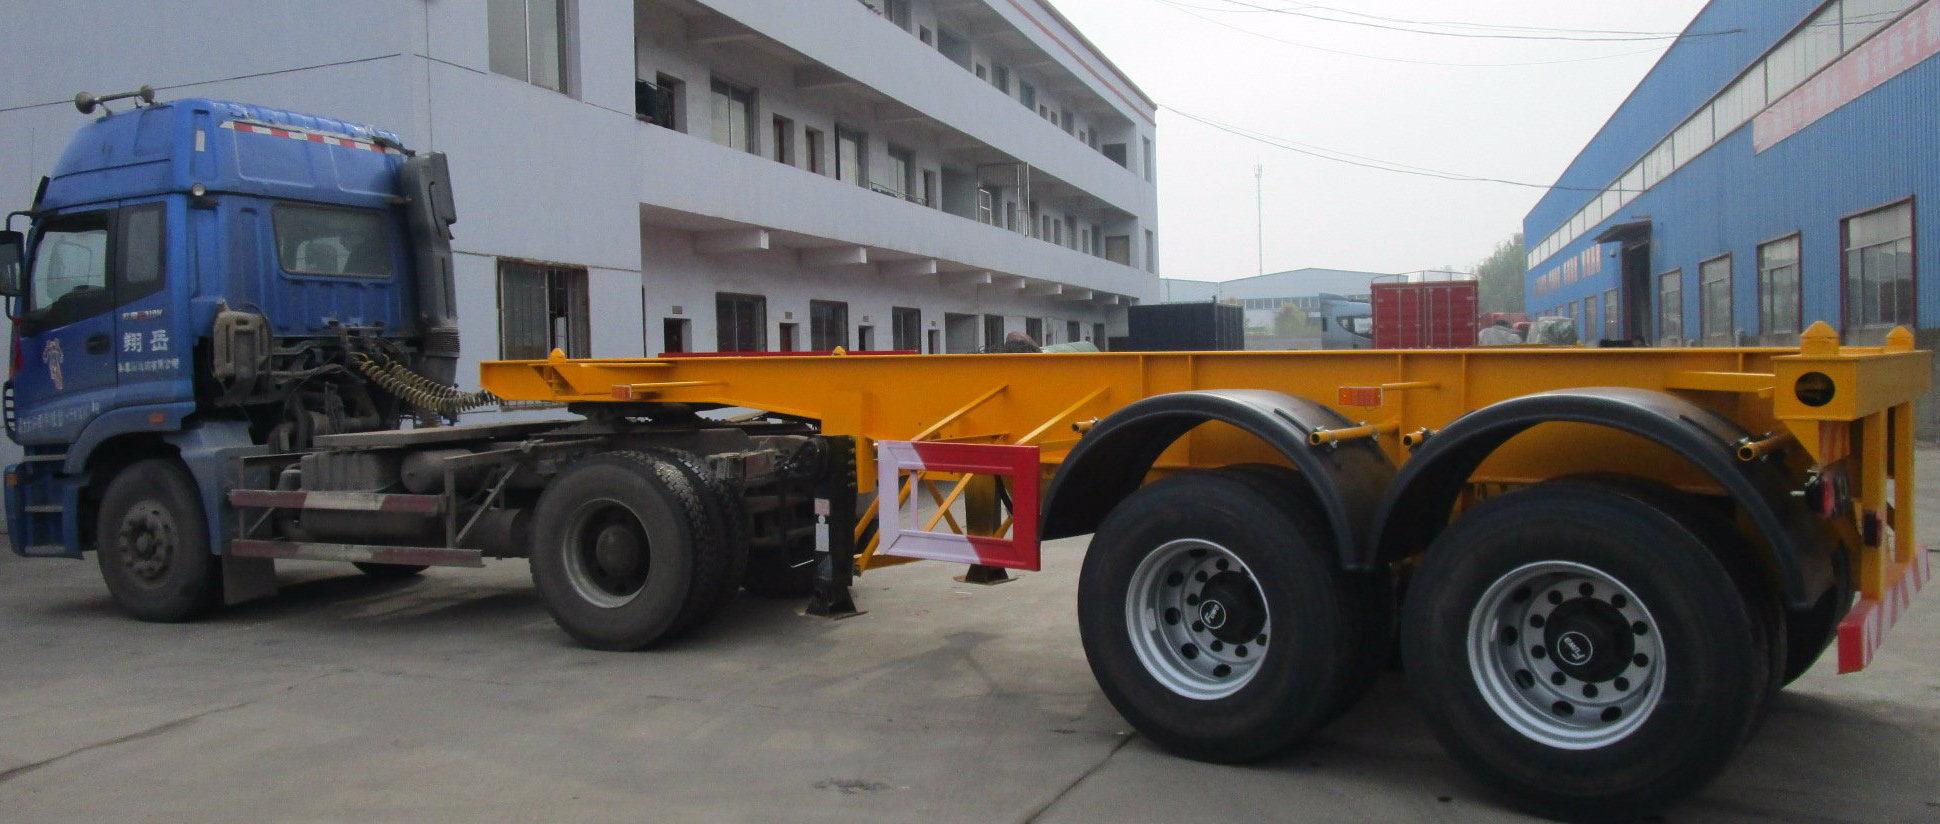 20 Feet Container Truck Semitrailer